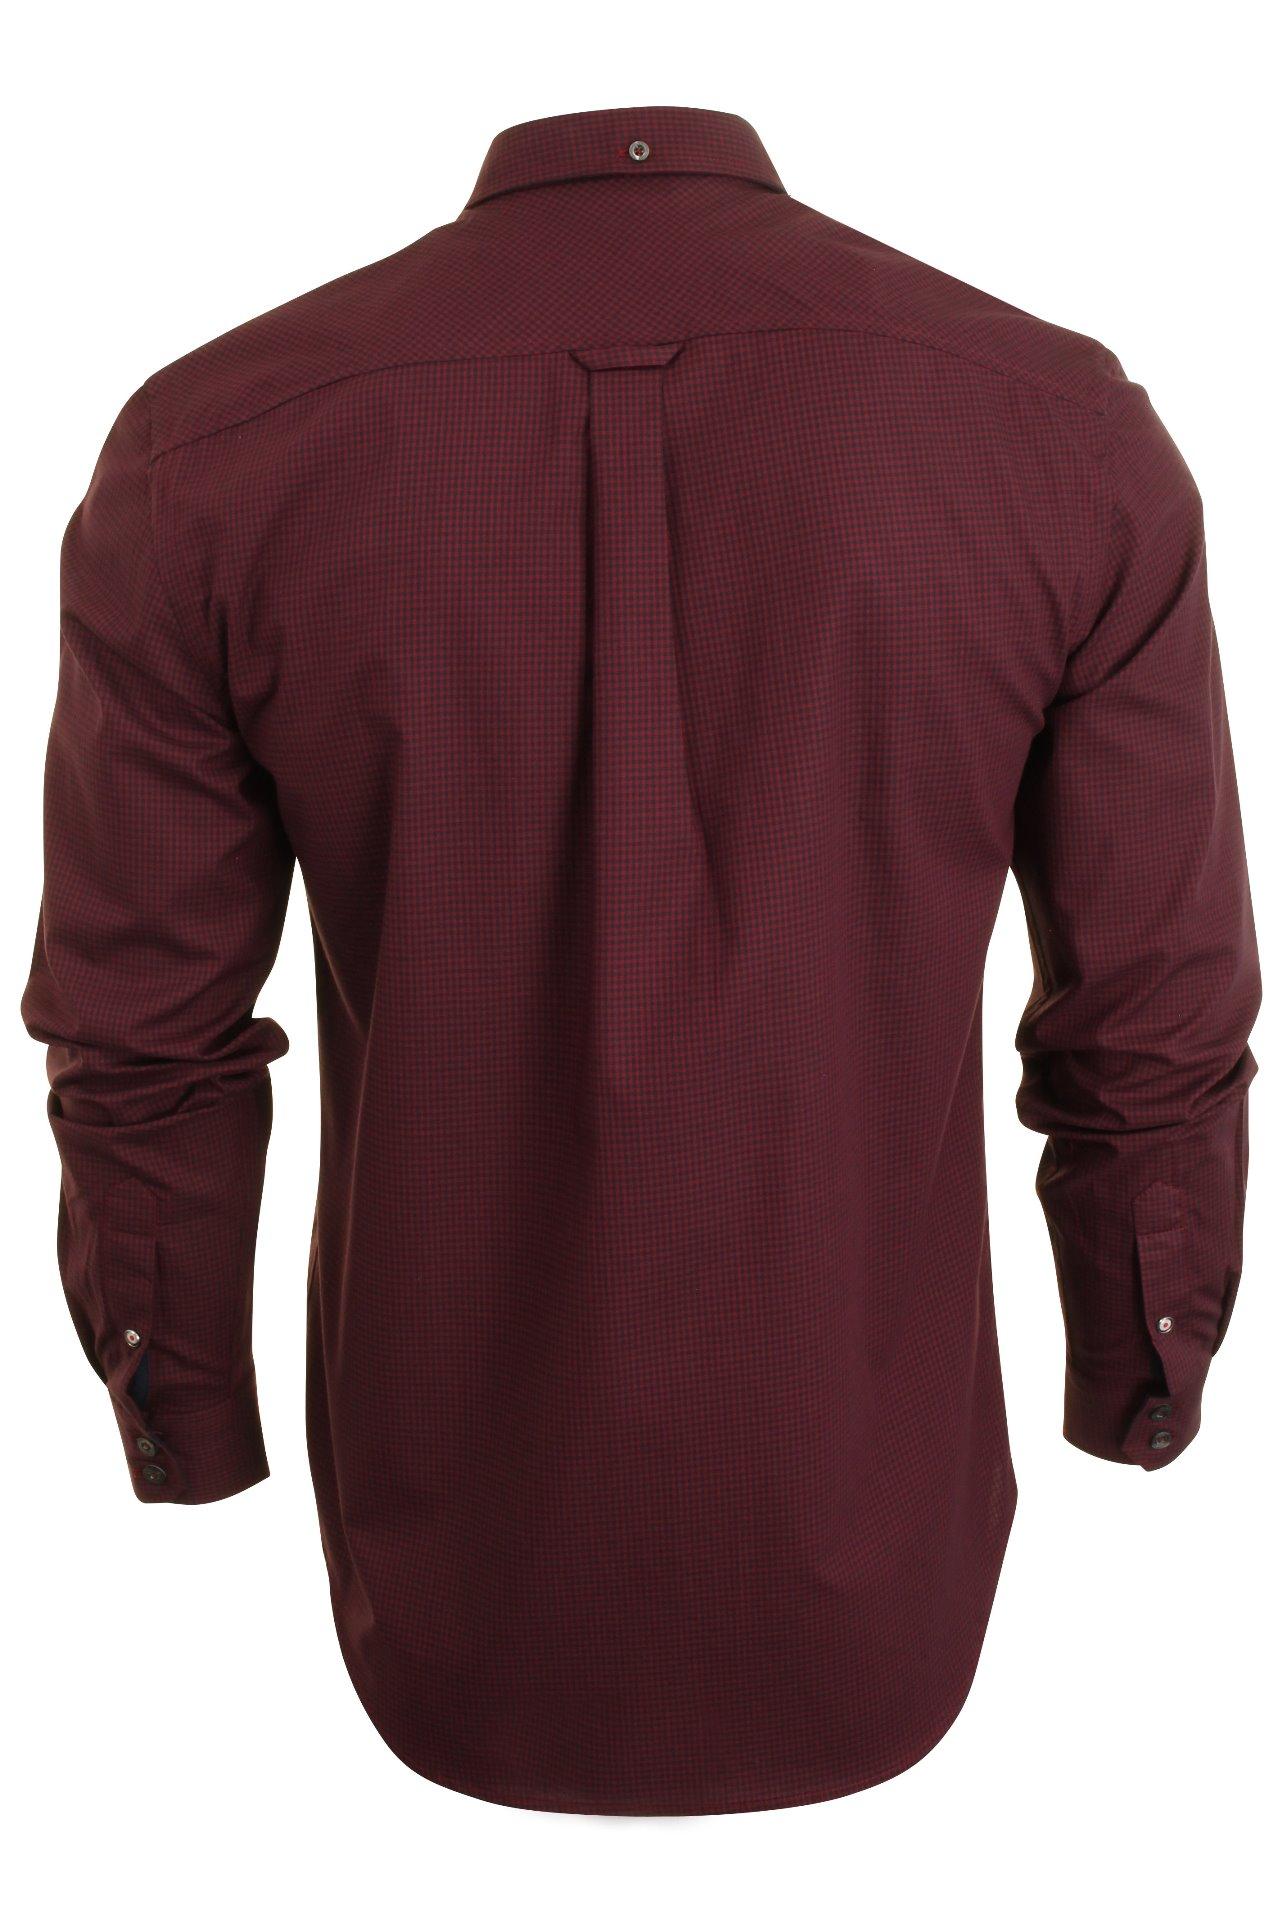 Mens-Classic-Gingham-Shirt-by-Ben-Sherman-Long-Sleeved thumbnail 11